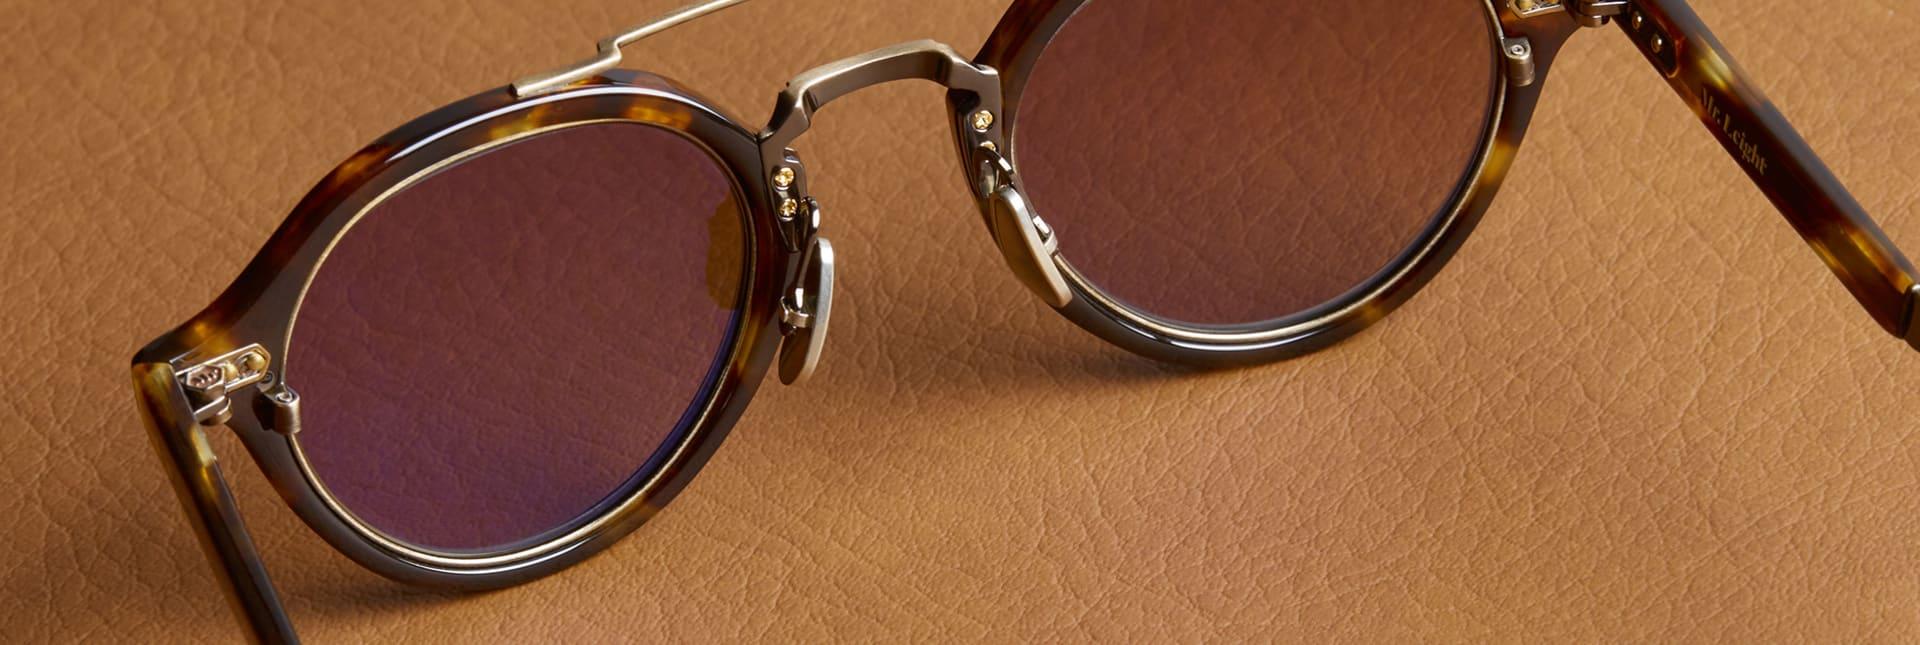 Mr. Leight® Sunglasses